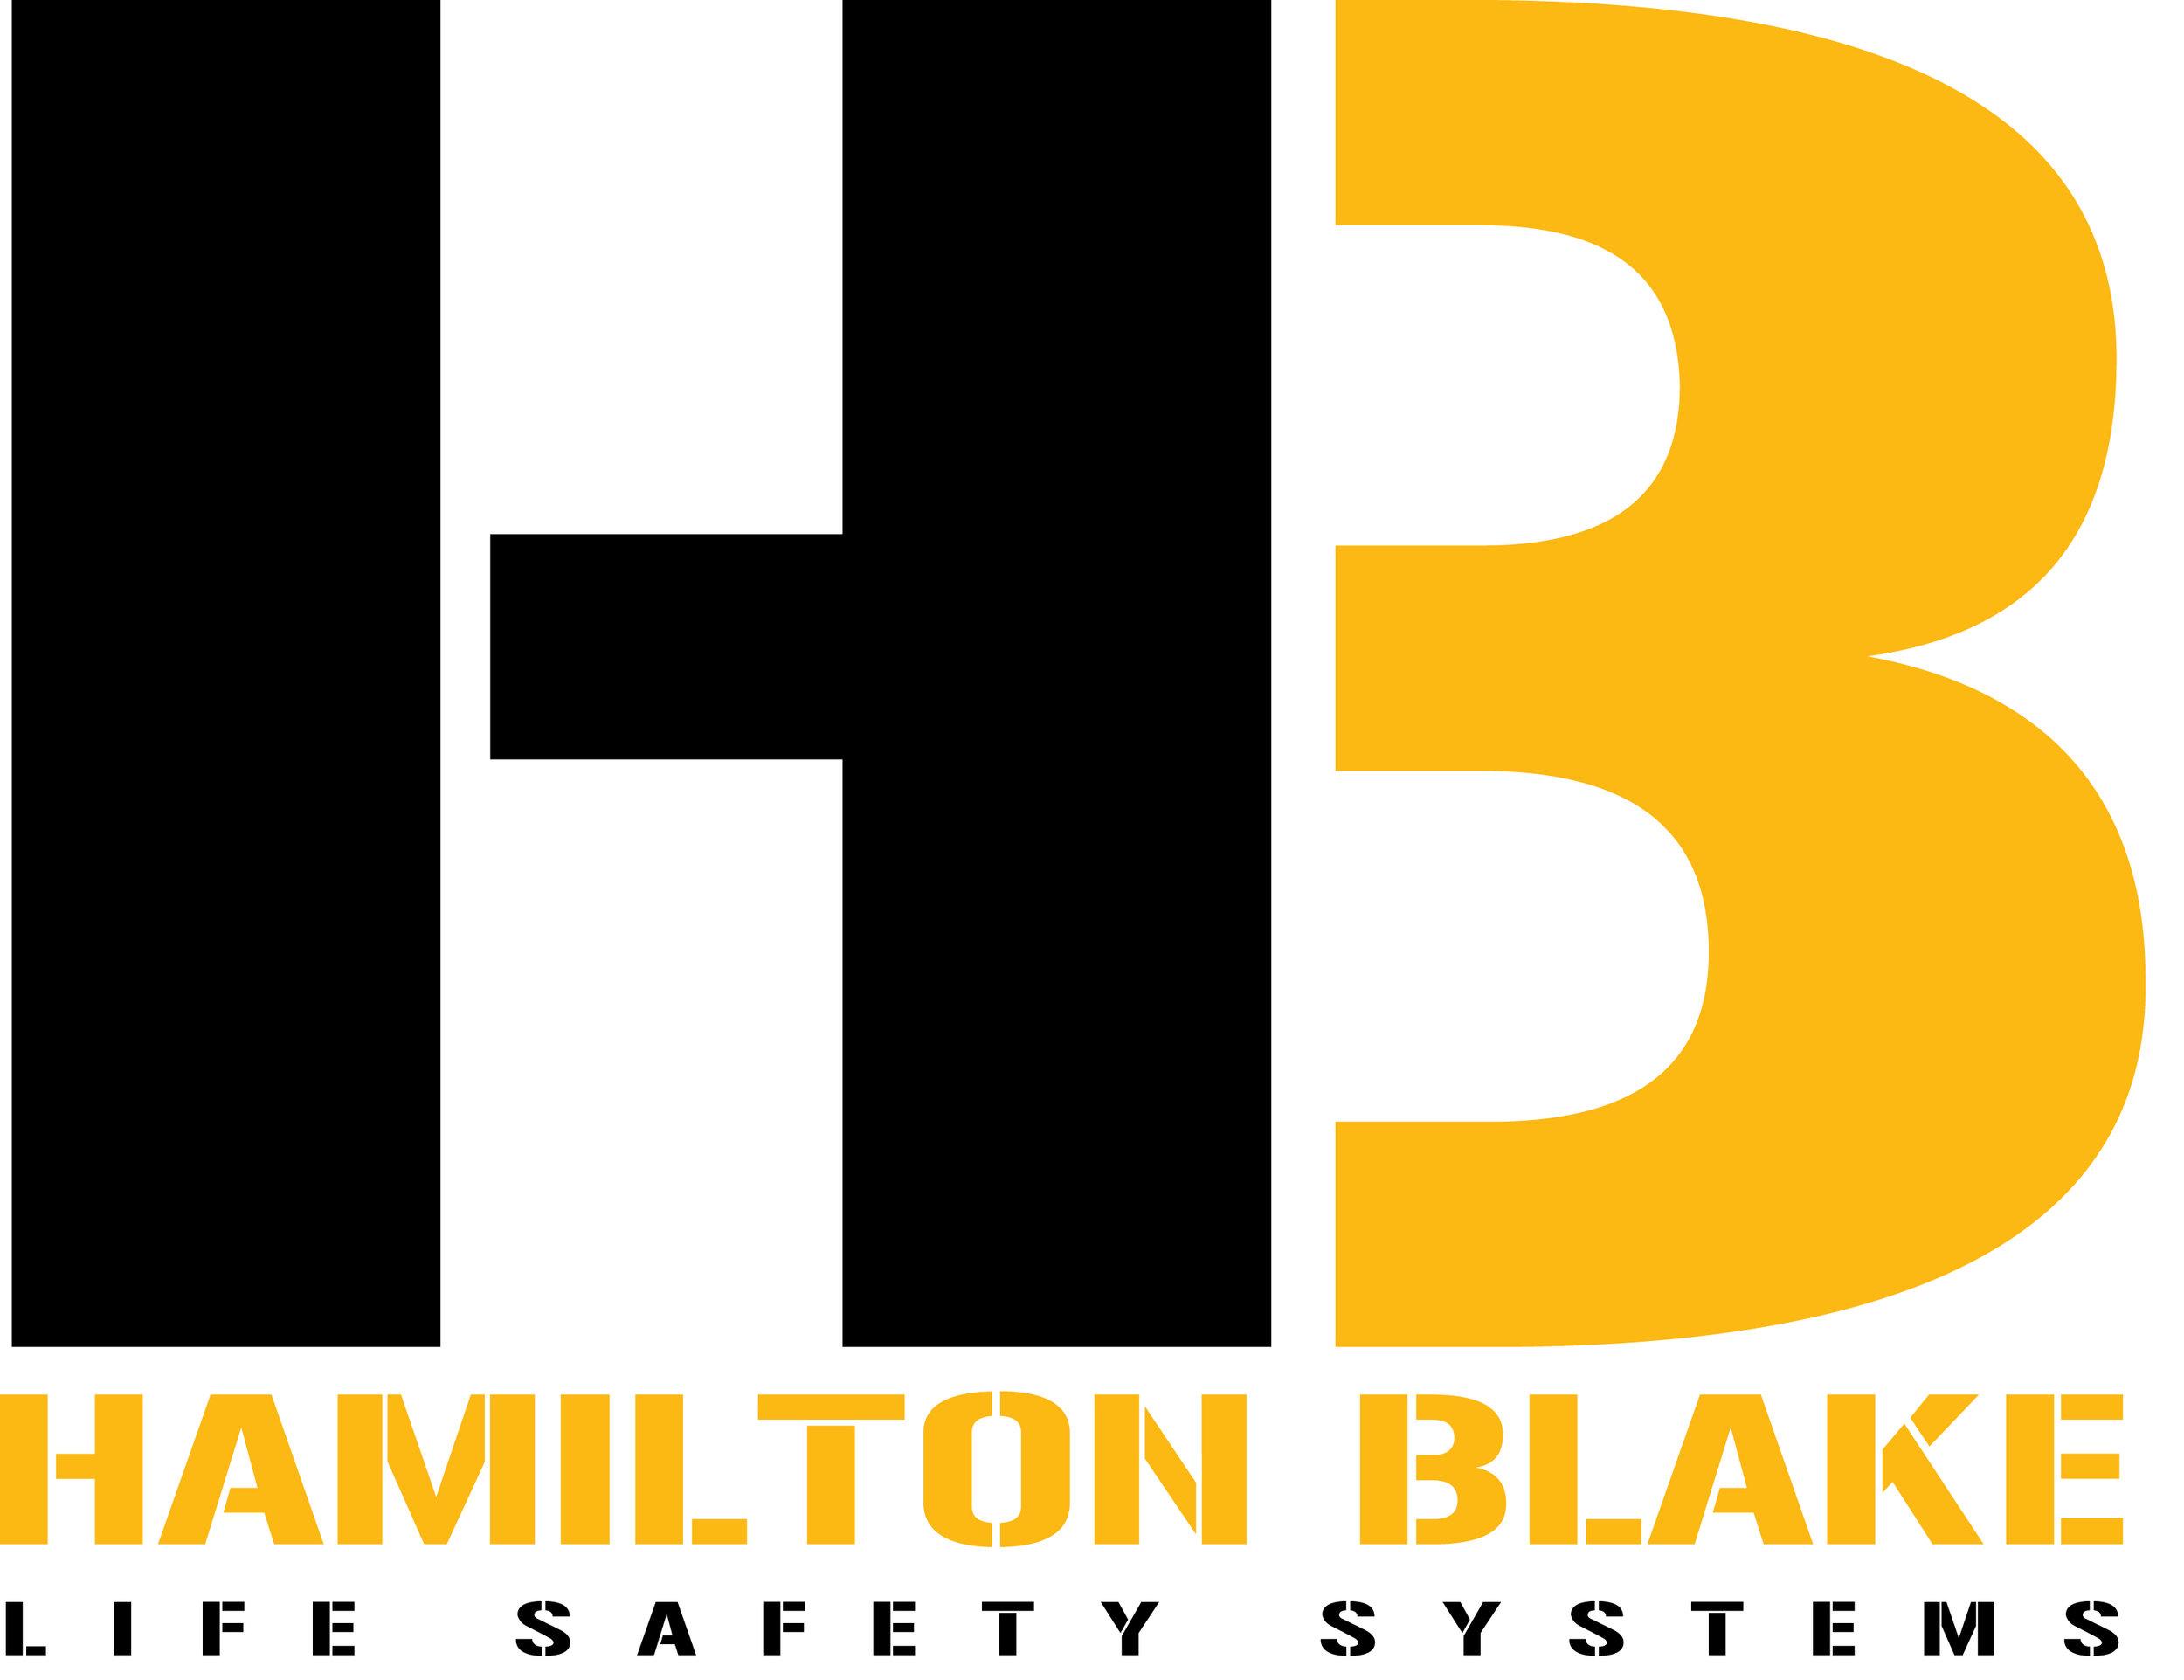 HAMILTON BLAKE LOGOS.jpg